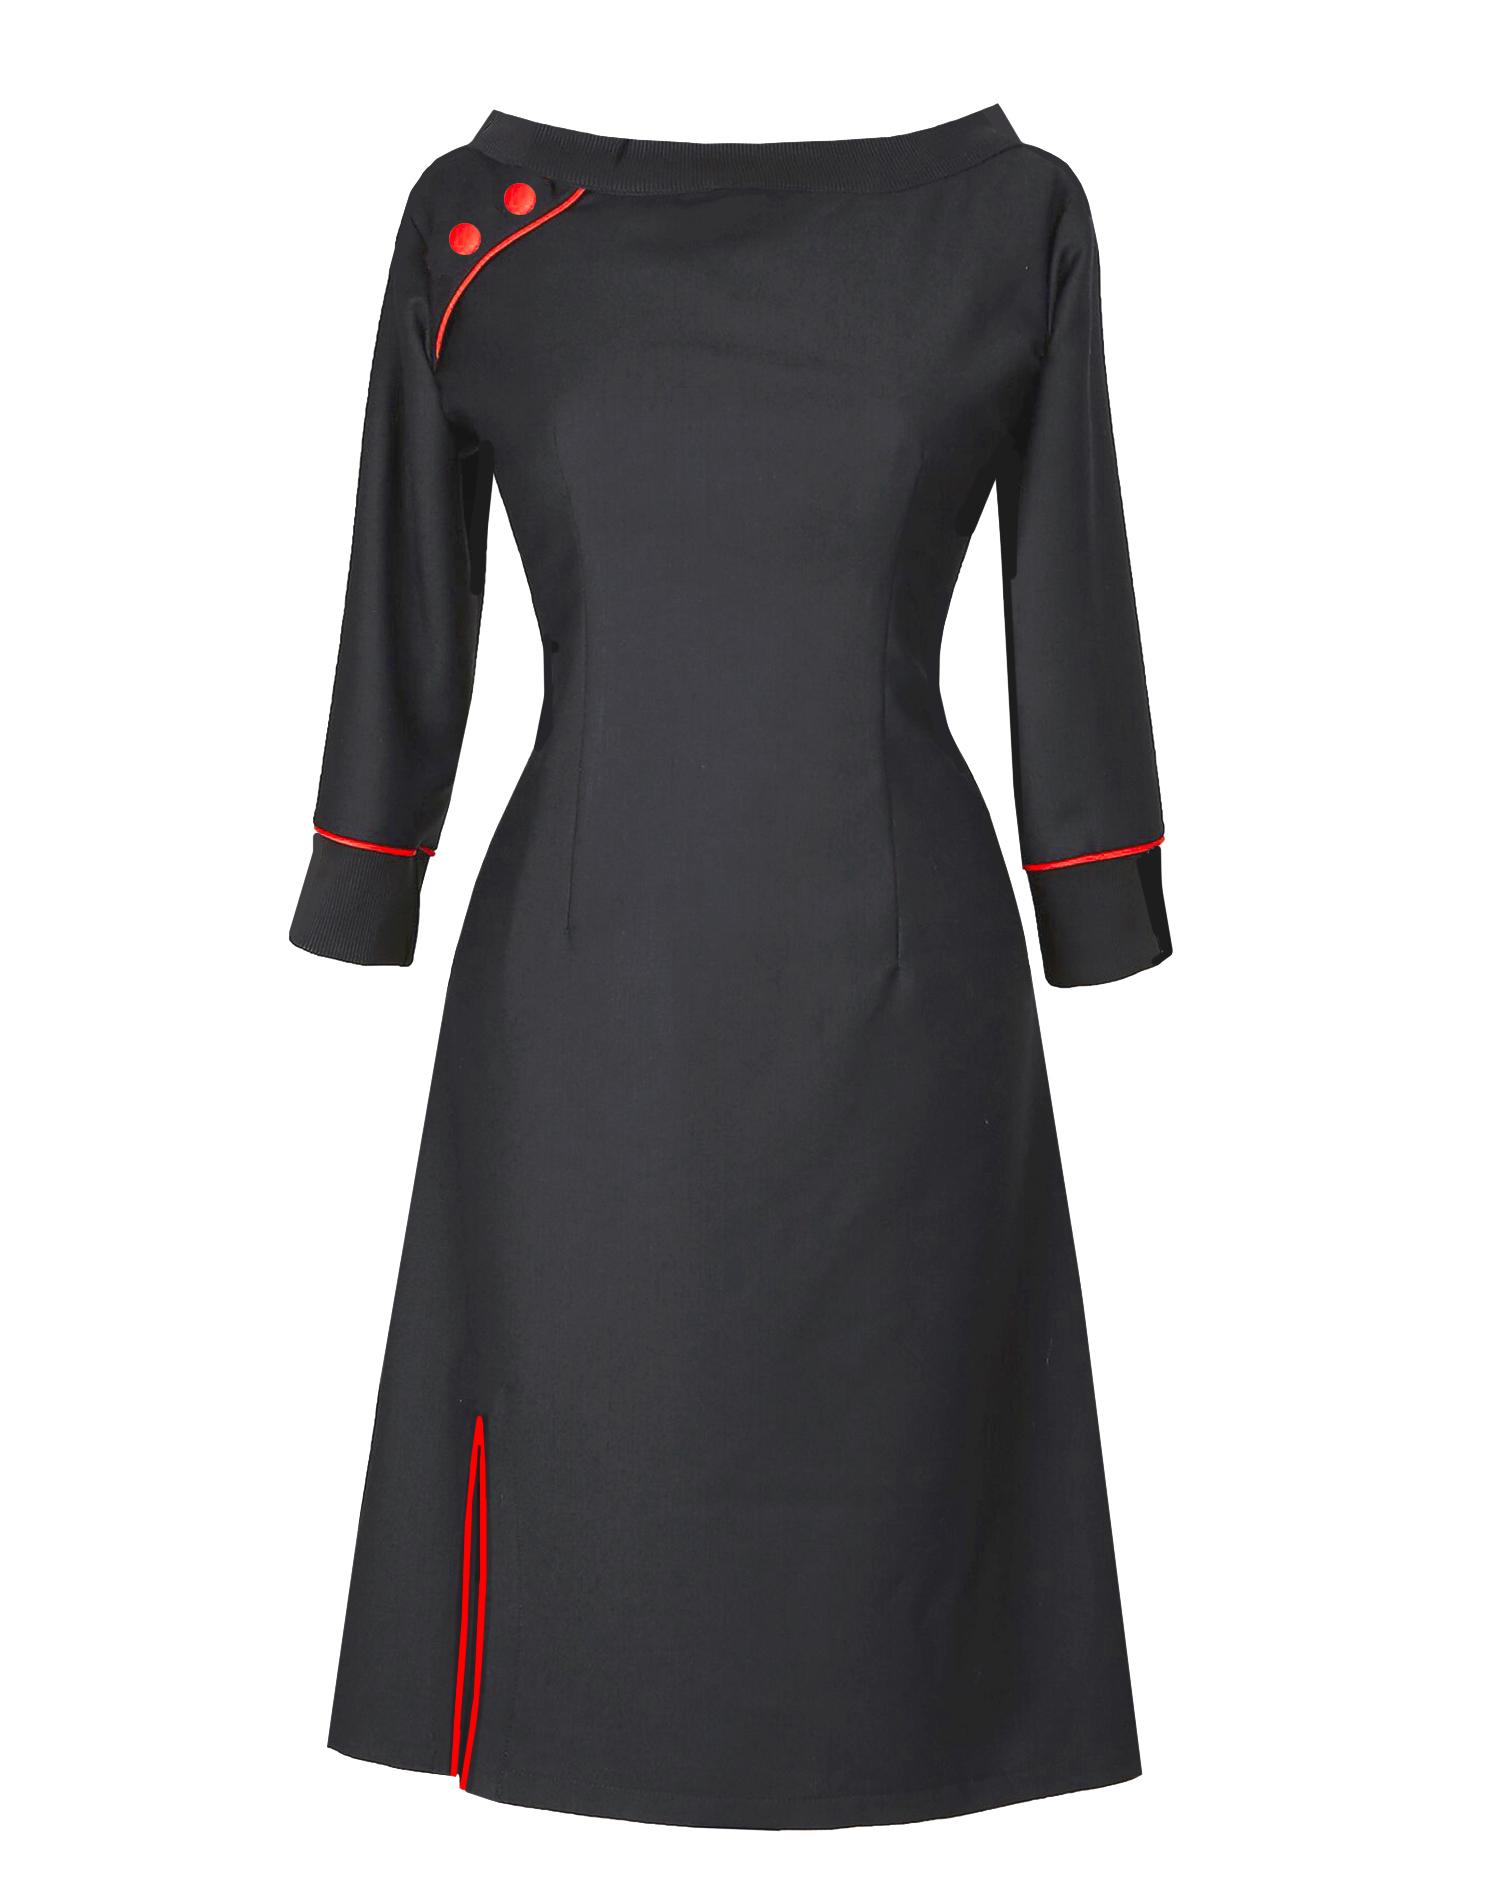 60daf879 Black Red dress made of organic wool